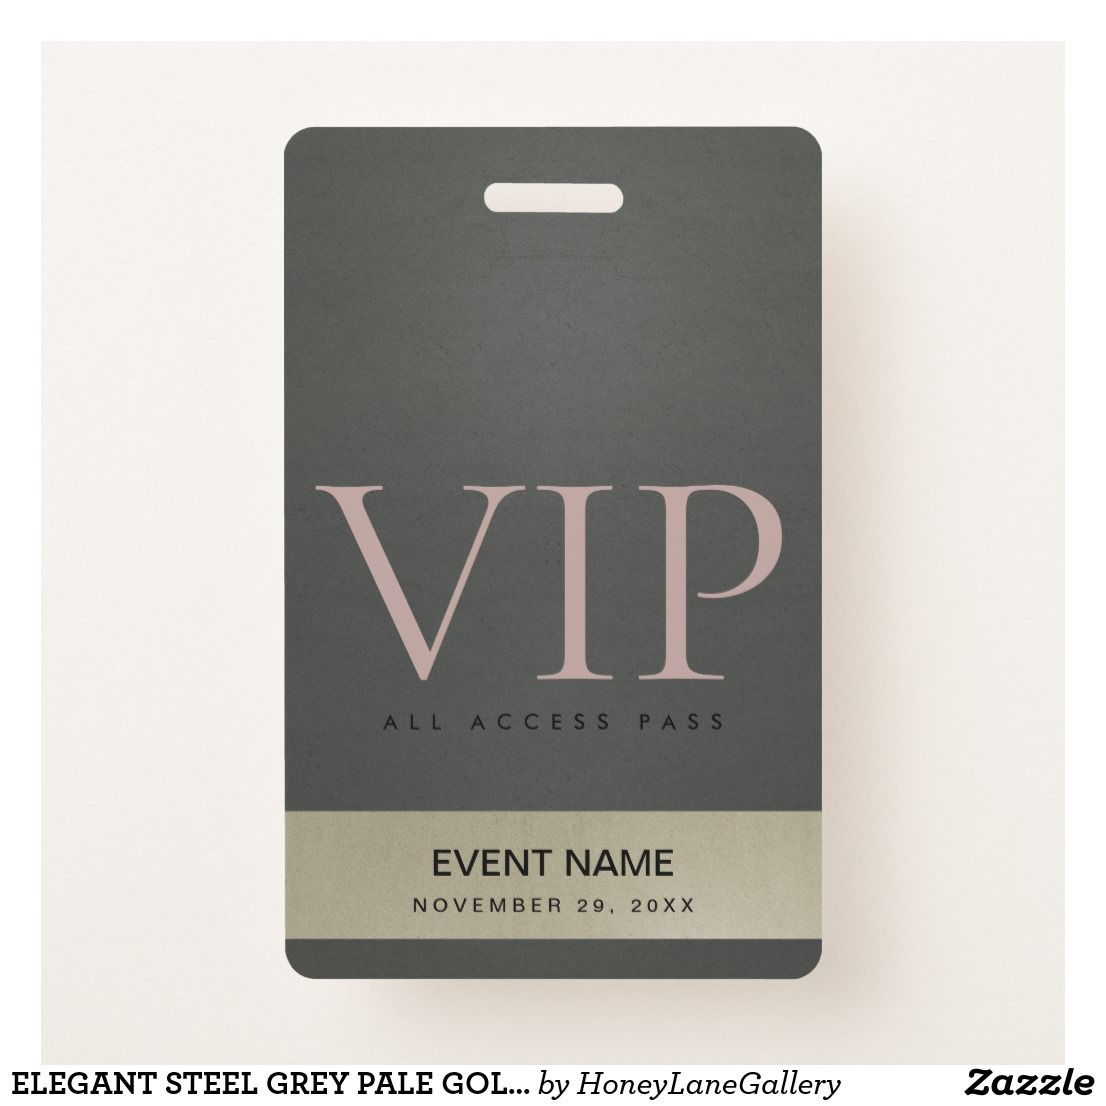 Elegant Steel Grey Pale Gold Vip Event Access Pass Badge Zazzle Com Steel Grey Pale Gold Pale